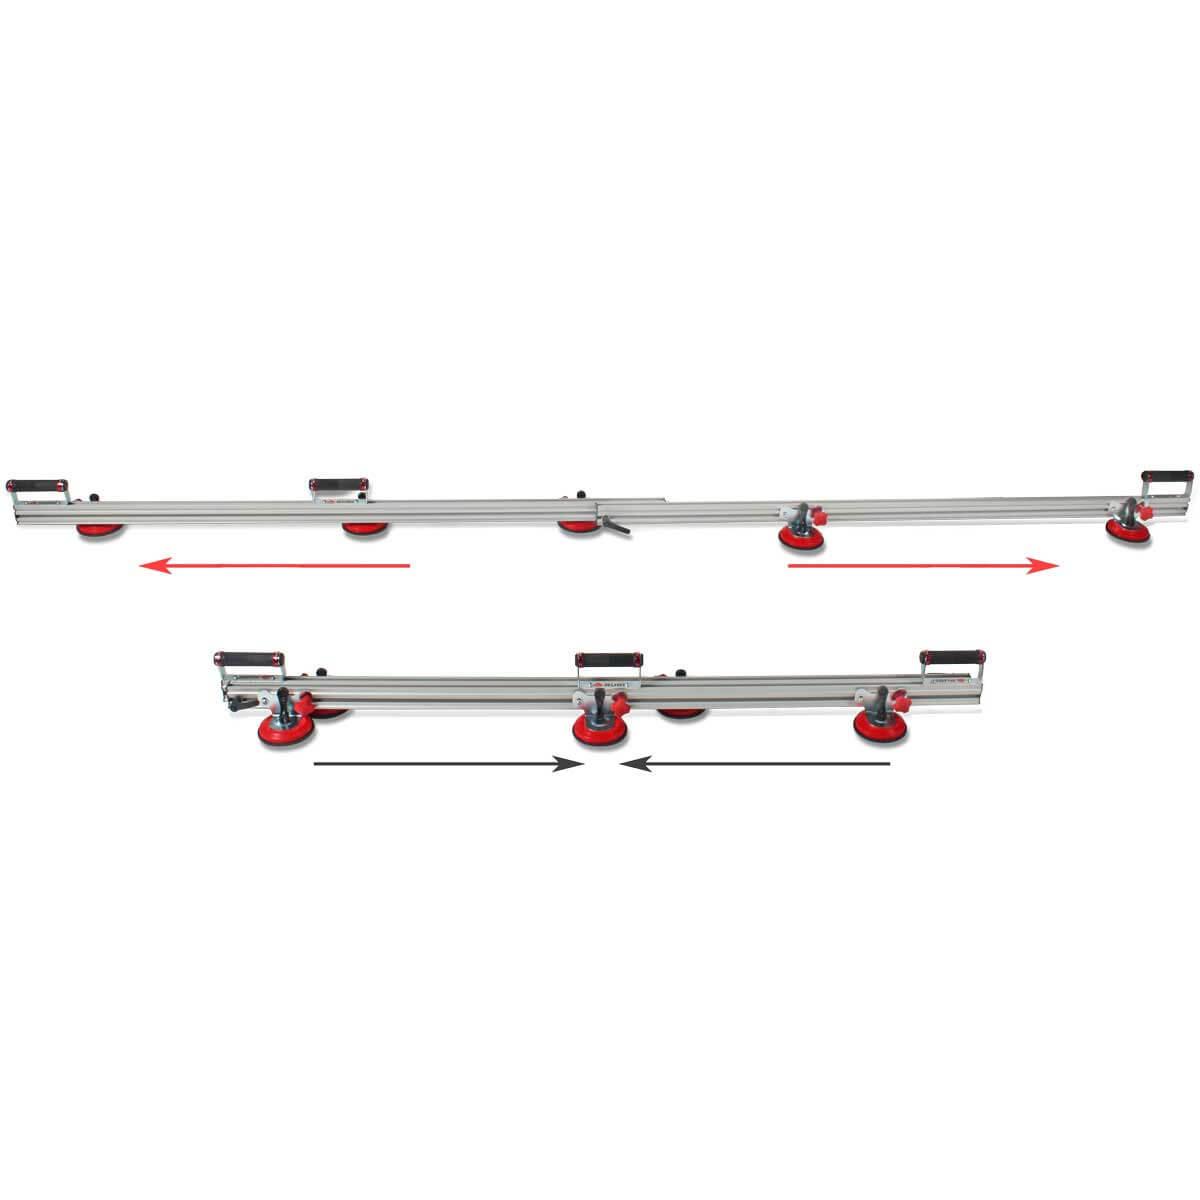 Rubi Slim Transport Kit assembly